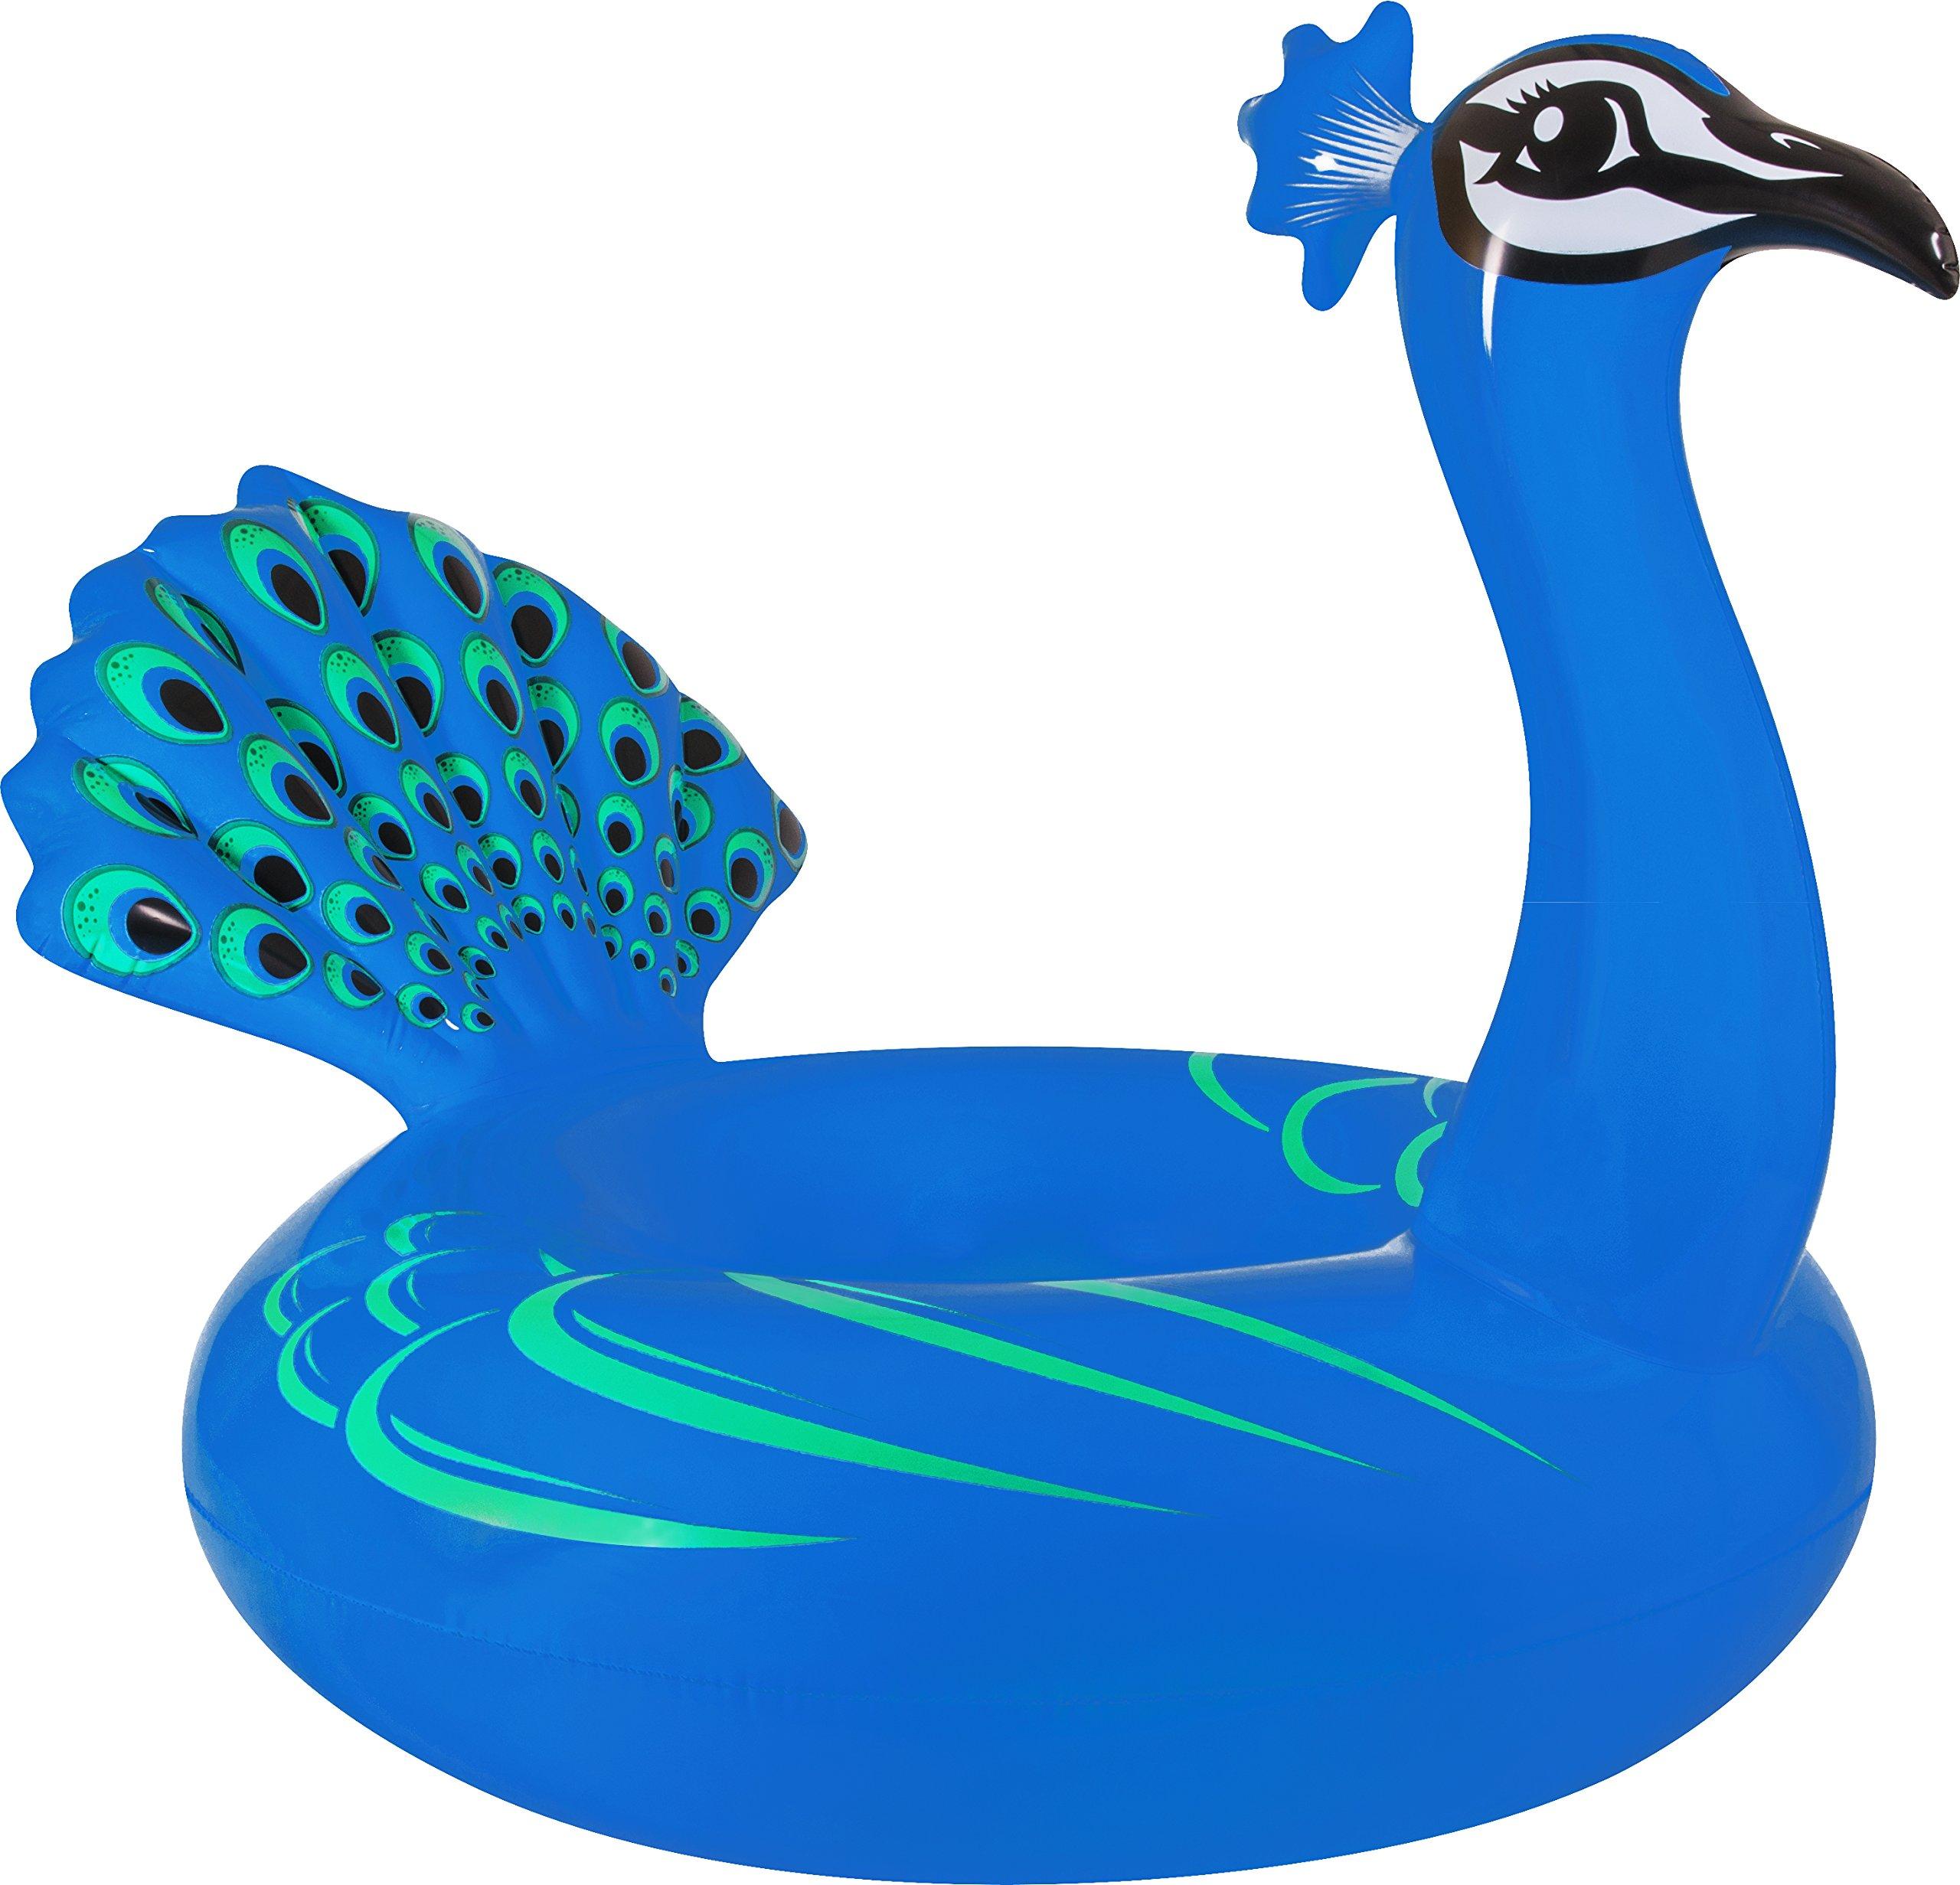 Coconut Float Peacock Swimming Pool Float, 61''